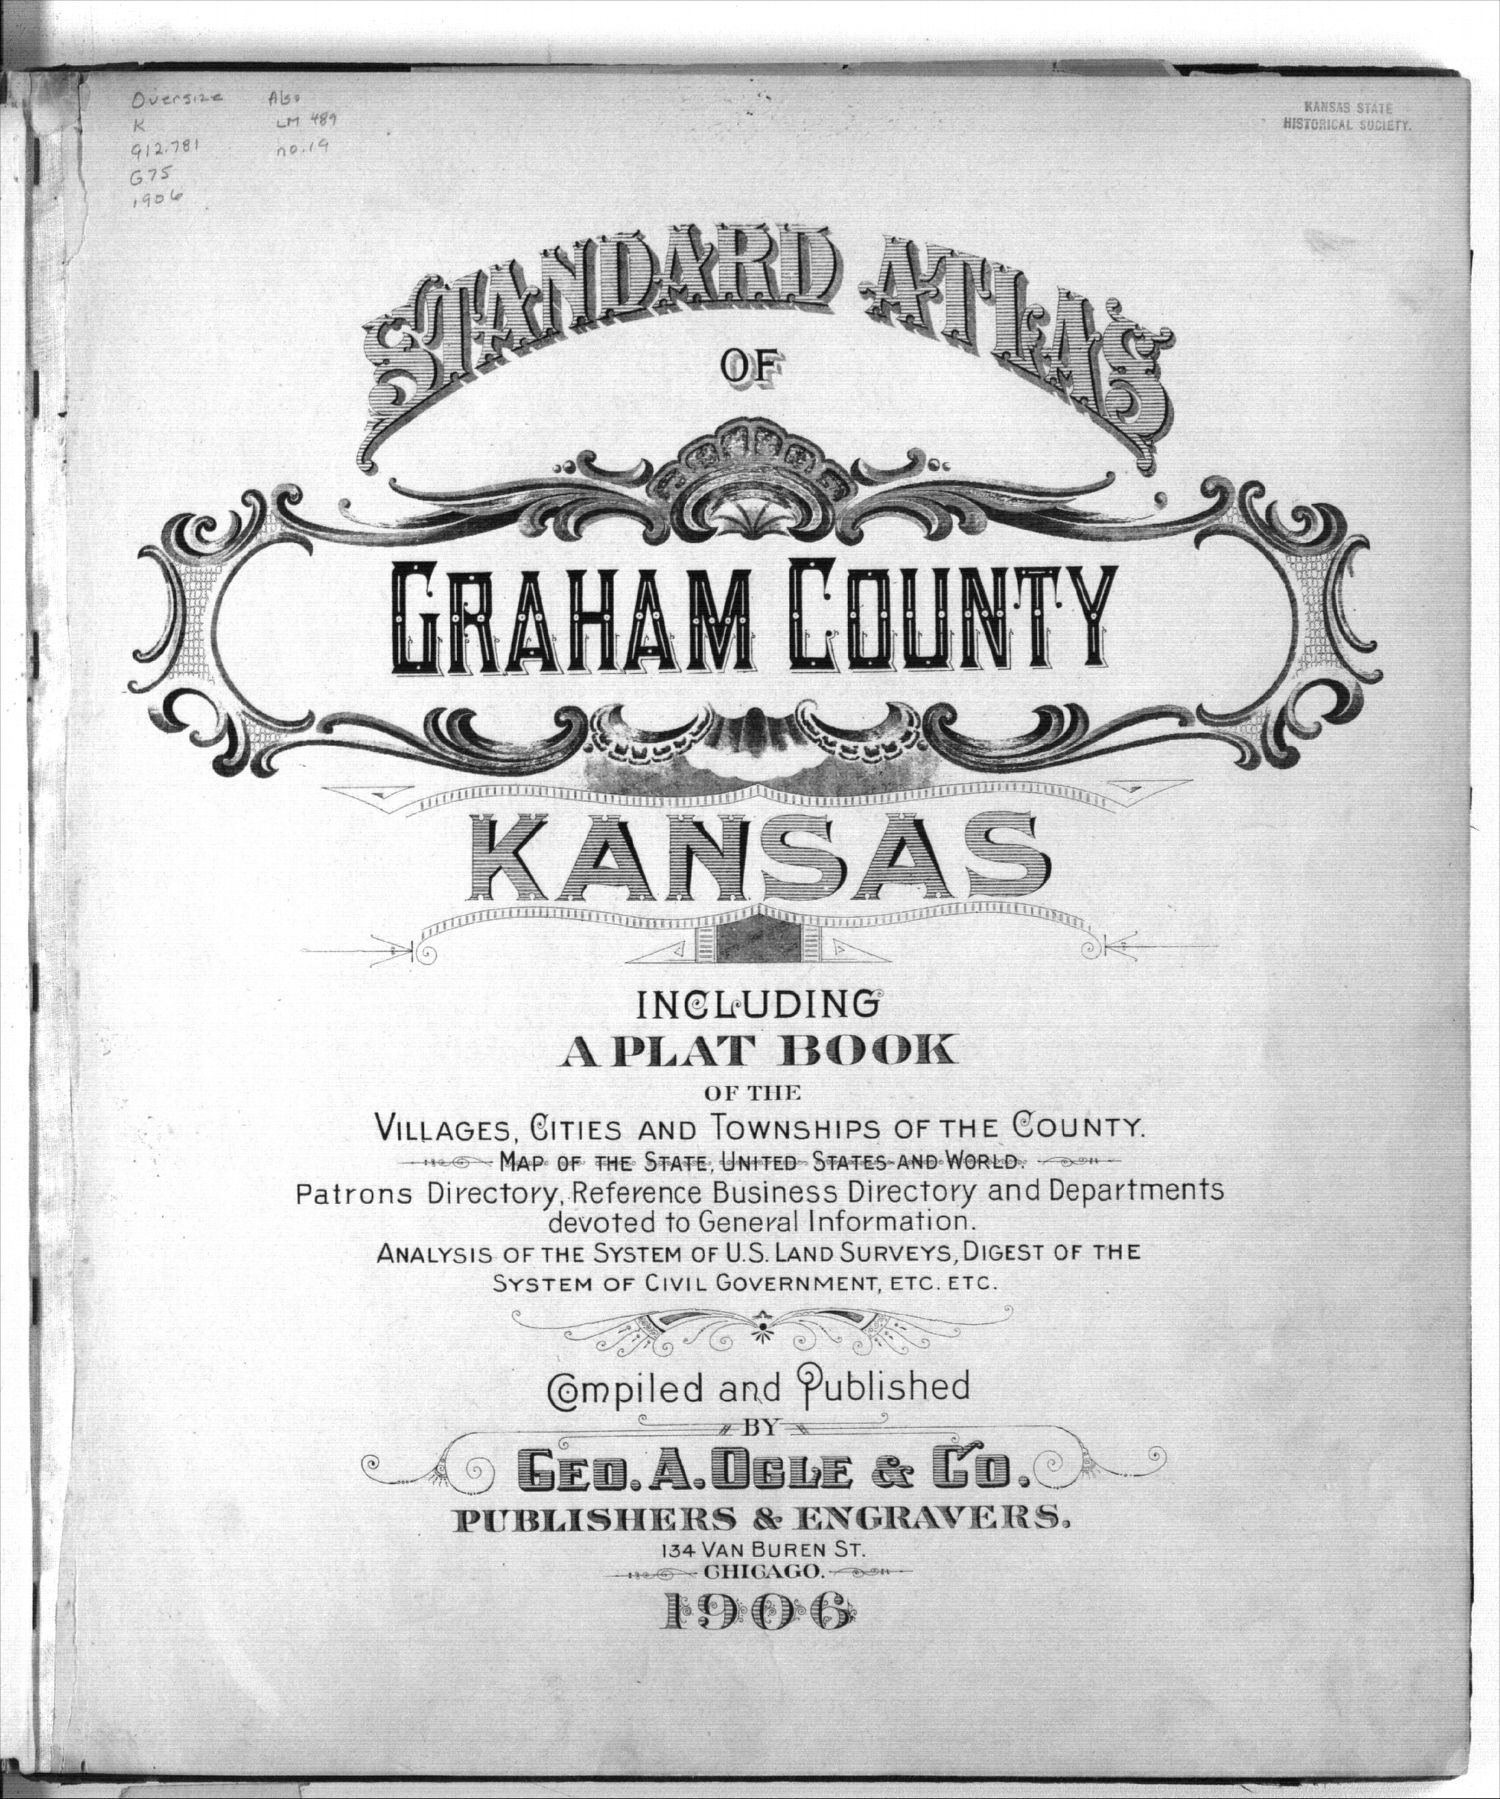 Standard atlas of Graham County, Kansas - Title page